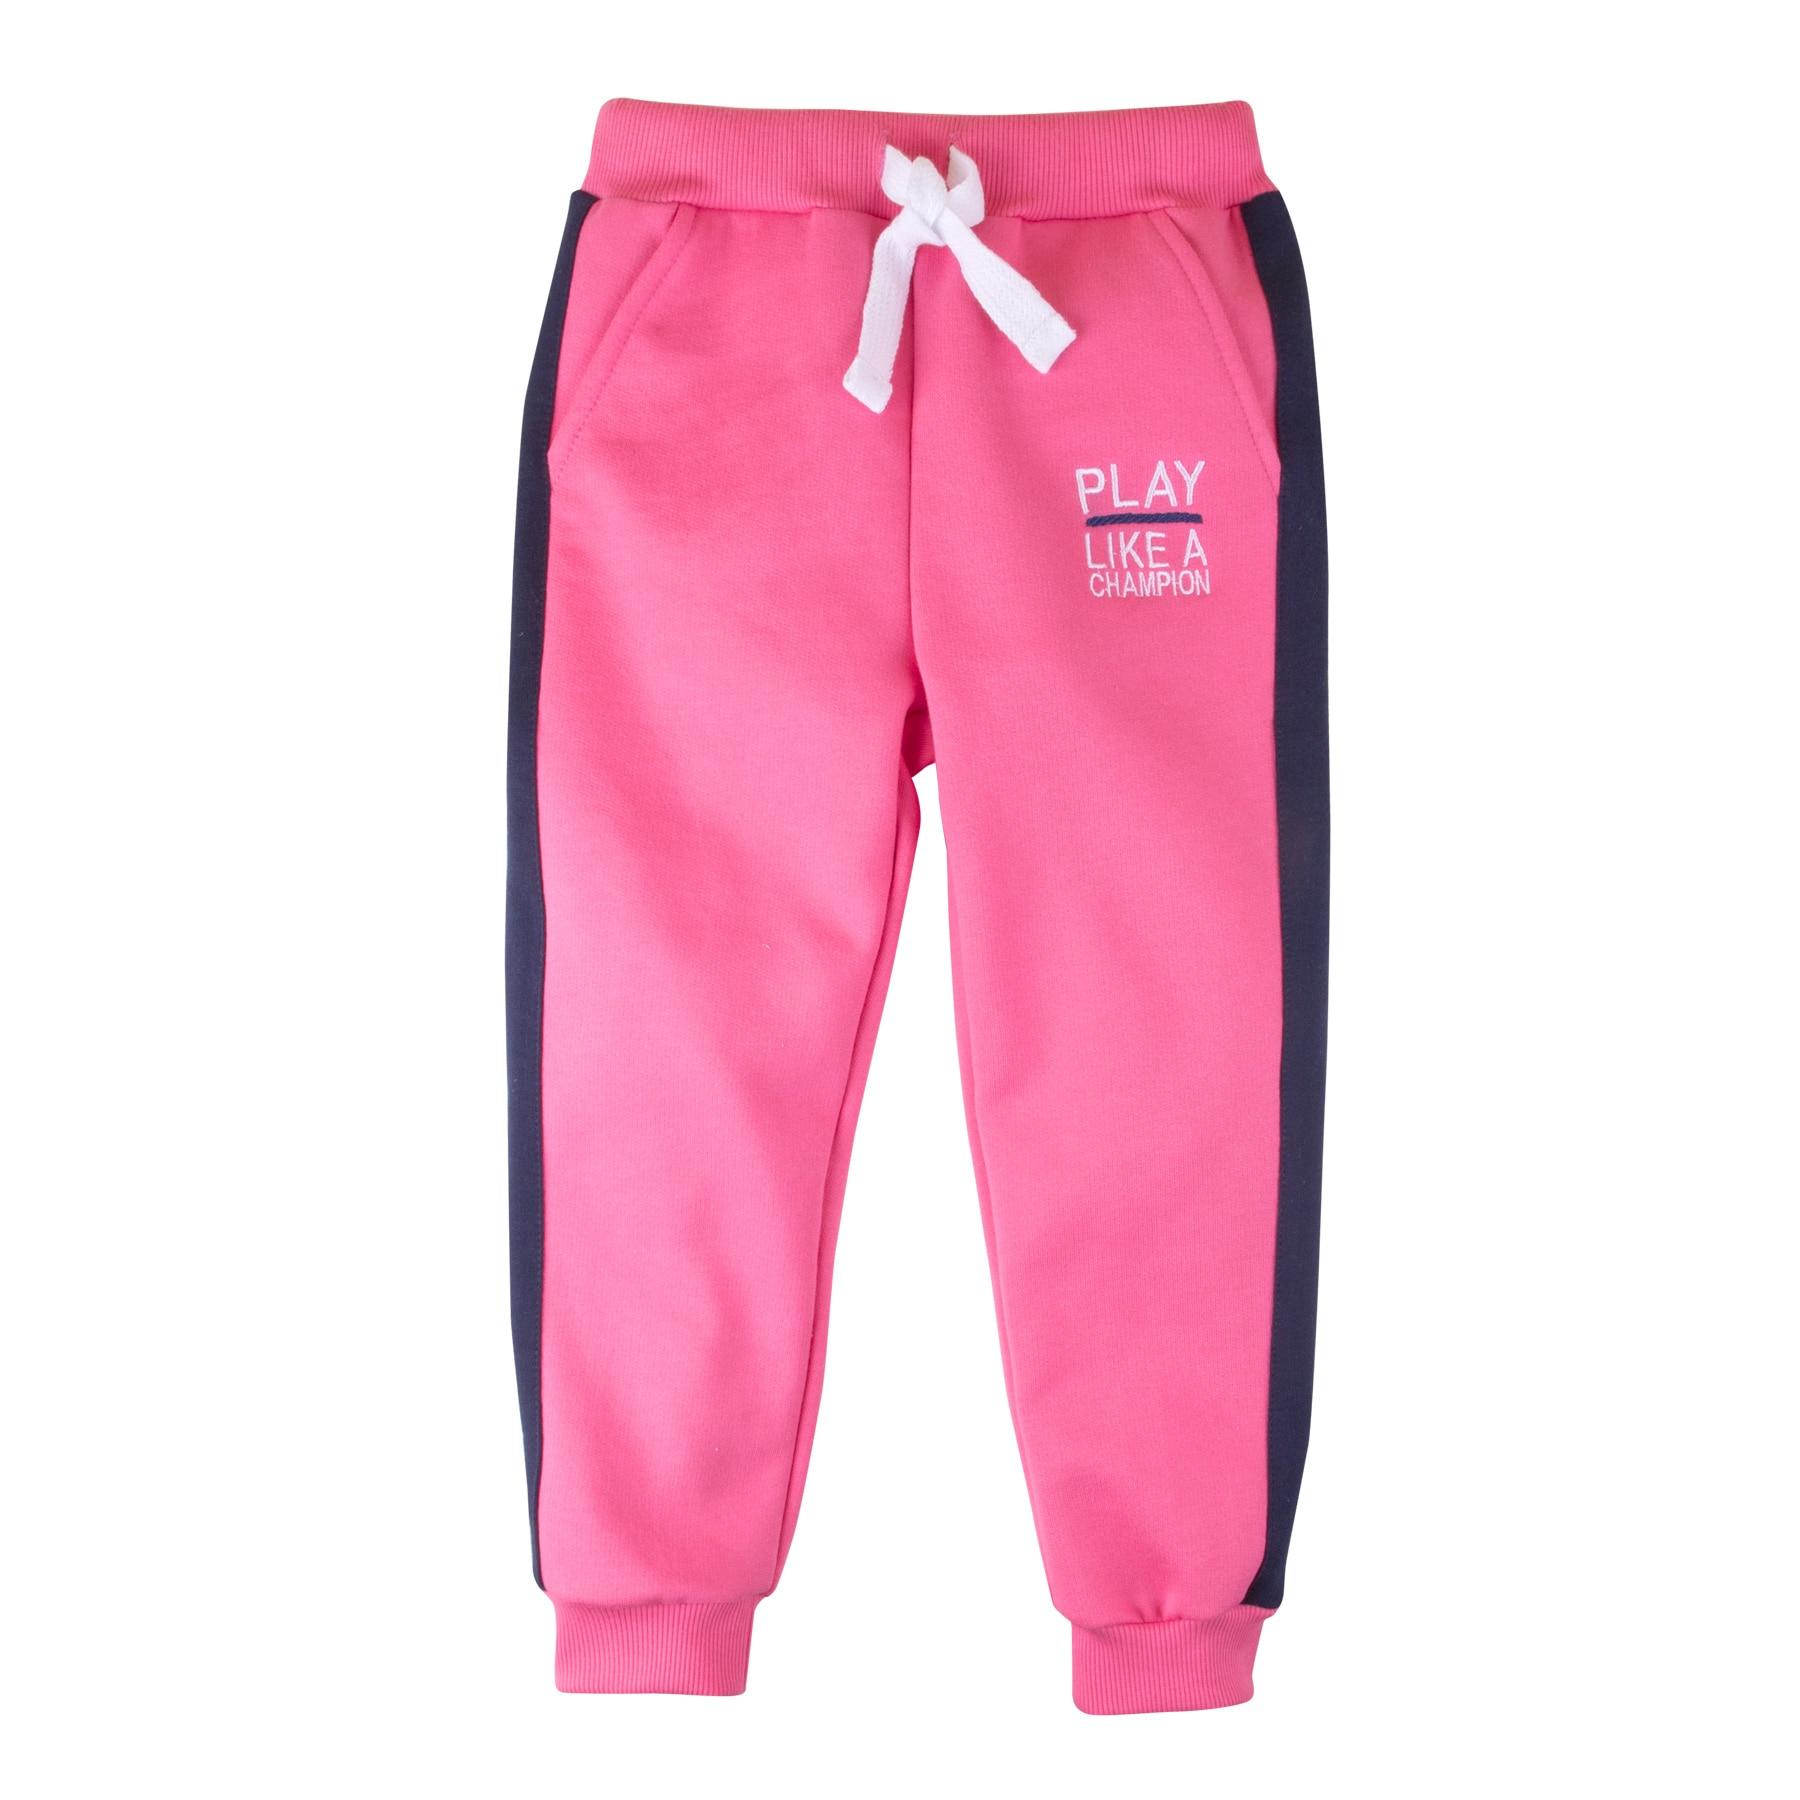 Pants for girls BOSSA NOVA 487B-462r kid clothes pants for girls bossa nova 487b 462b kid clothes